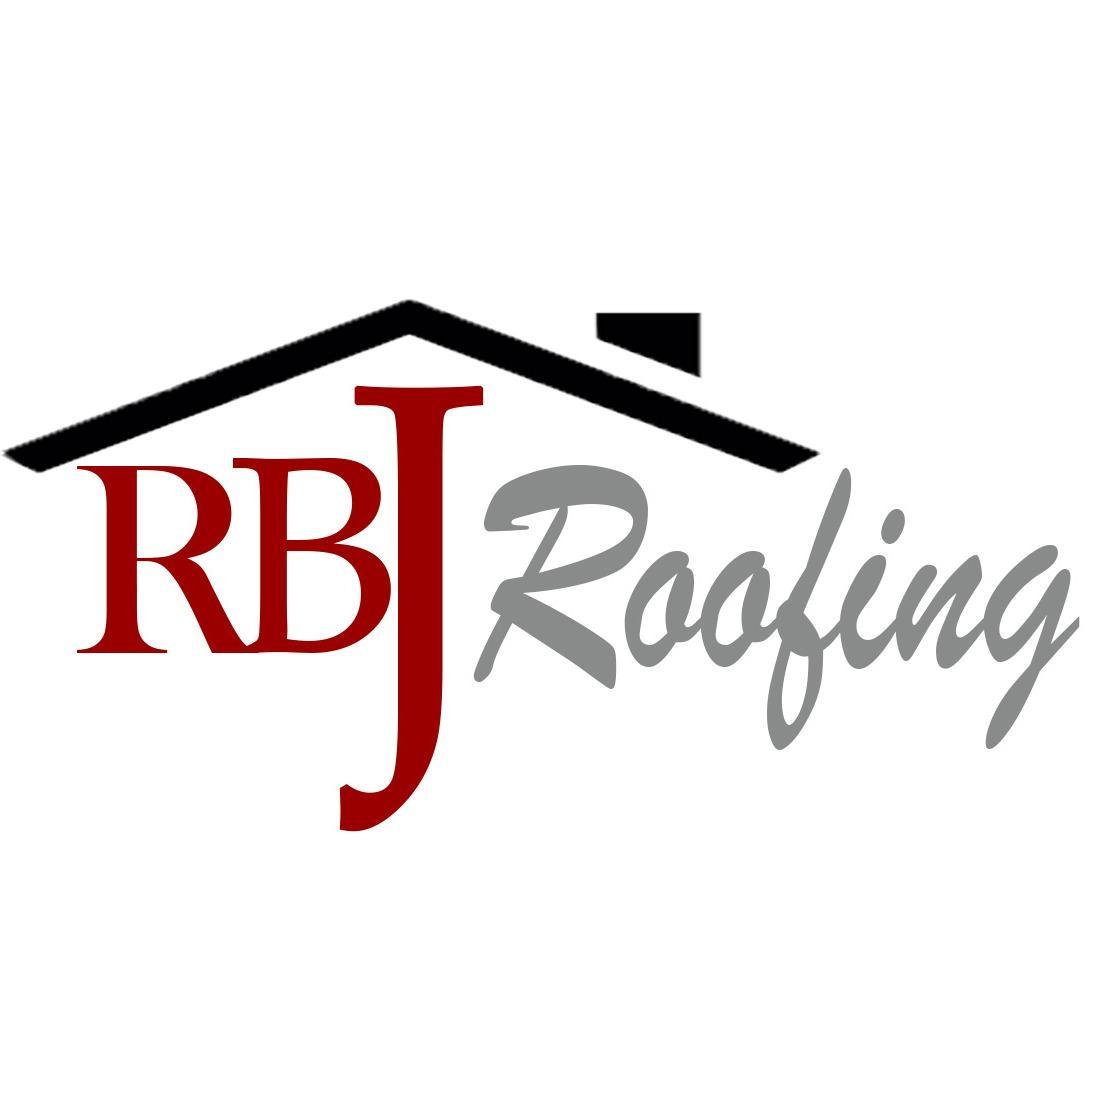 RBJ Roofing image 5